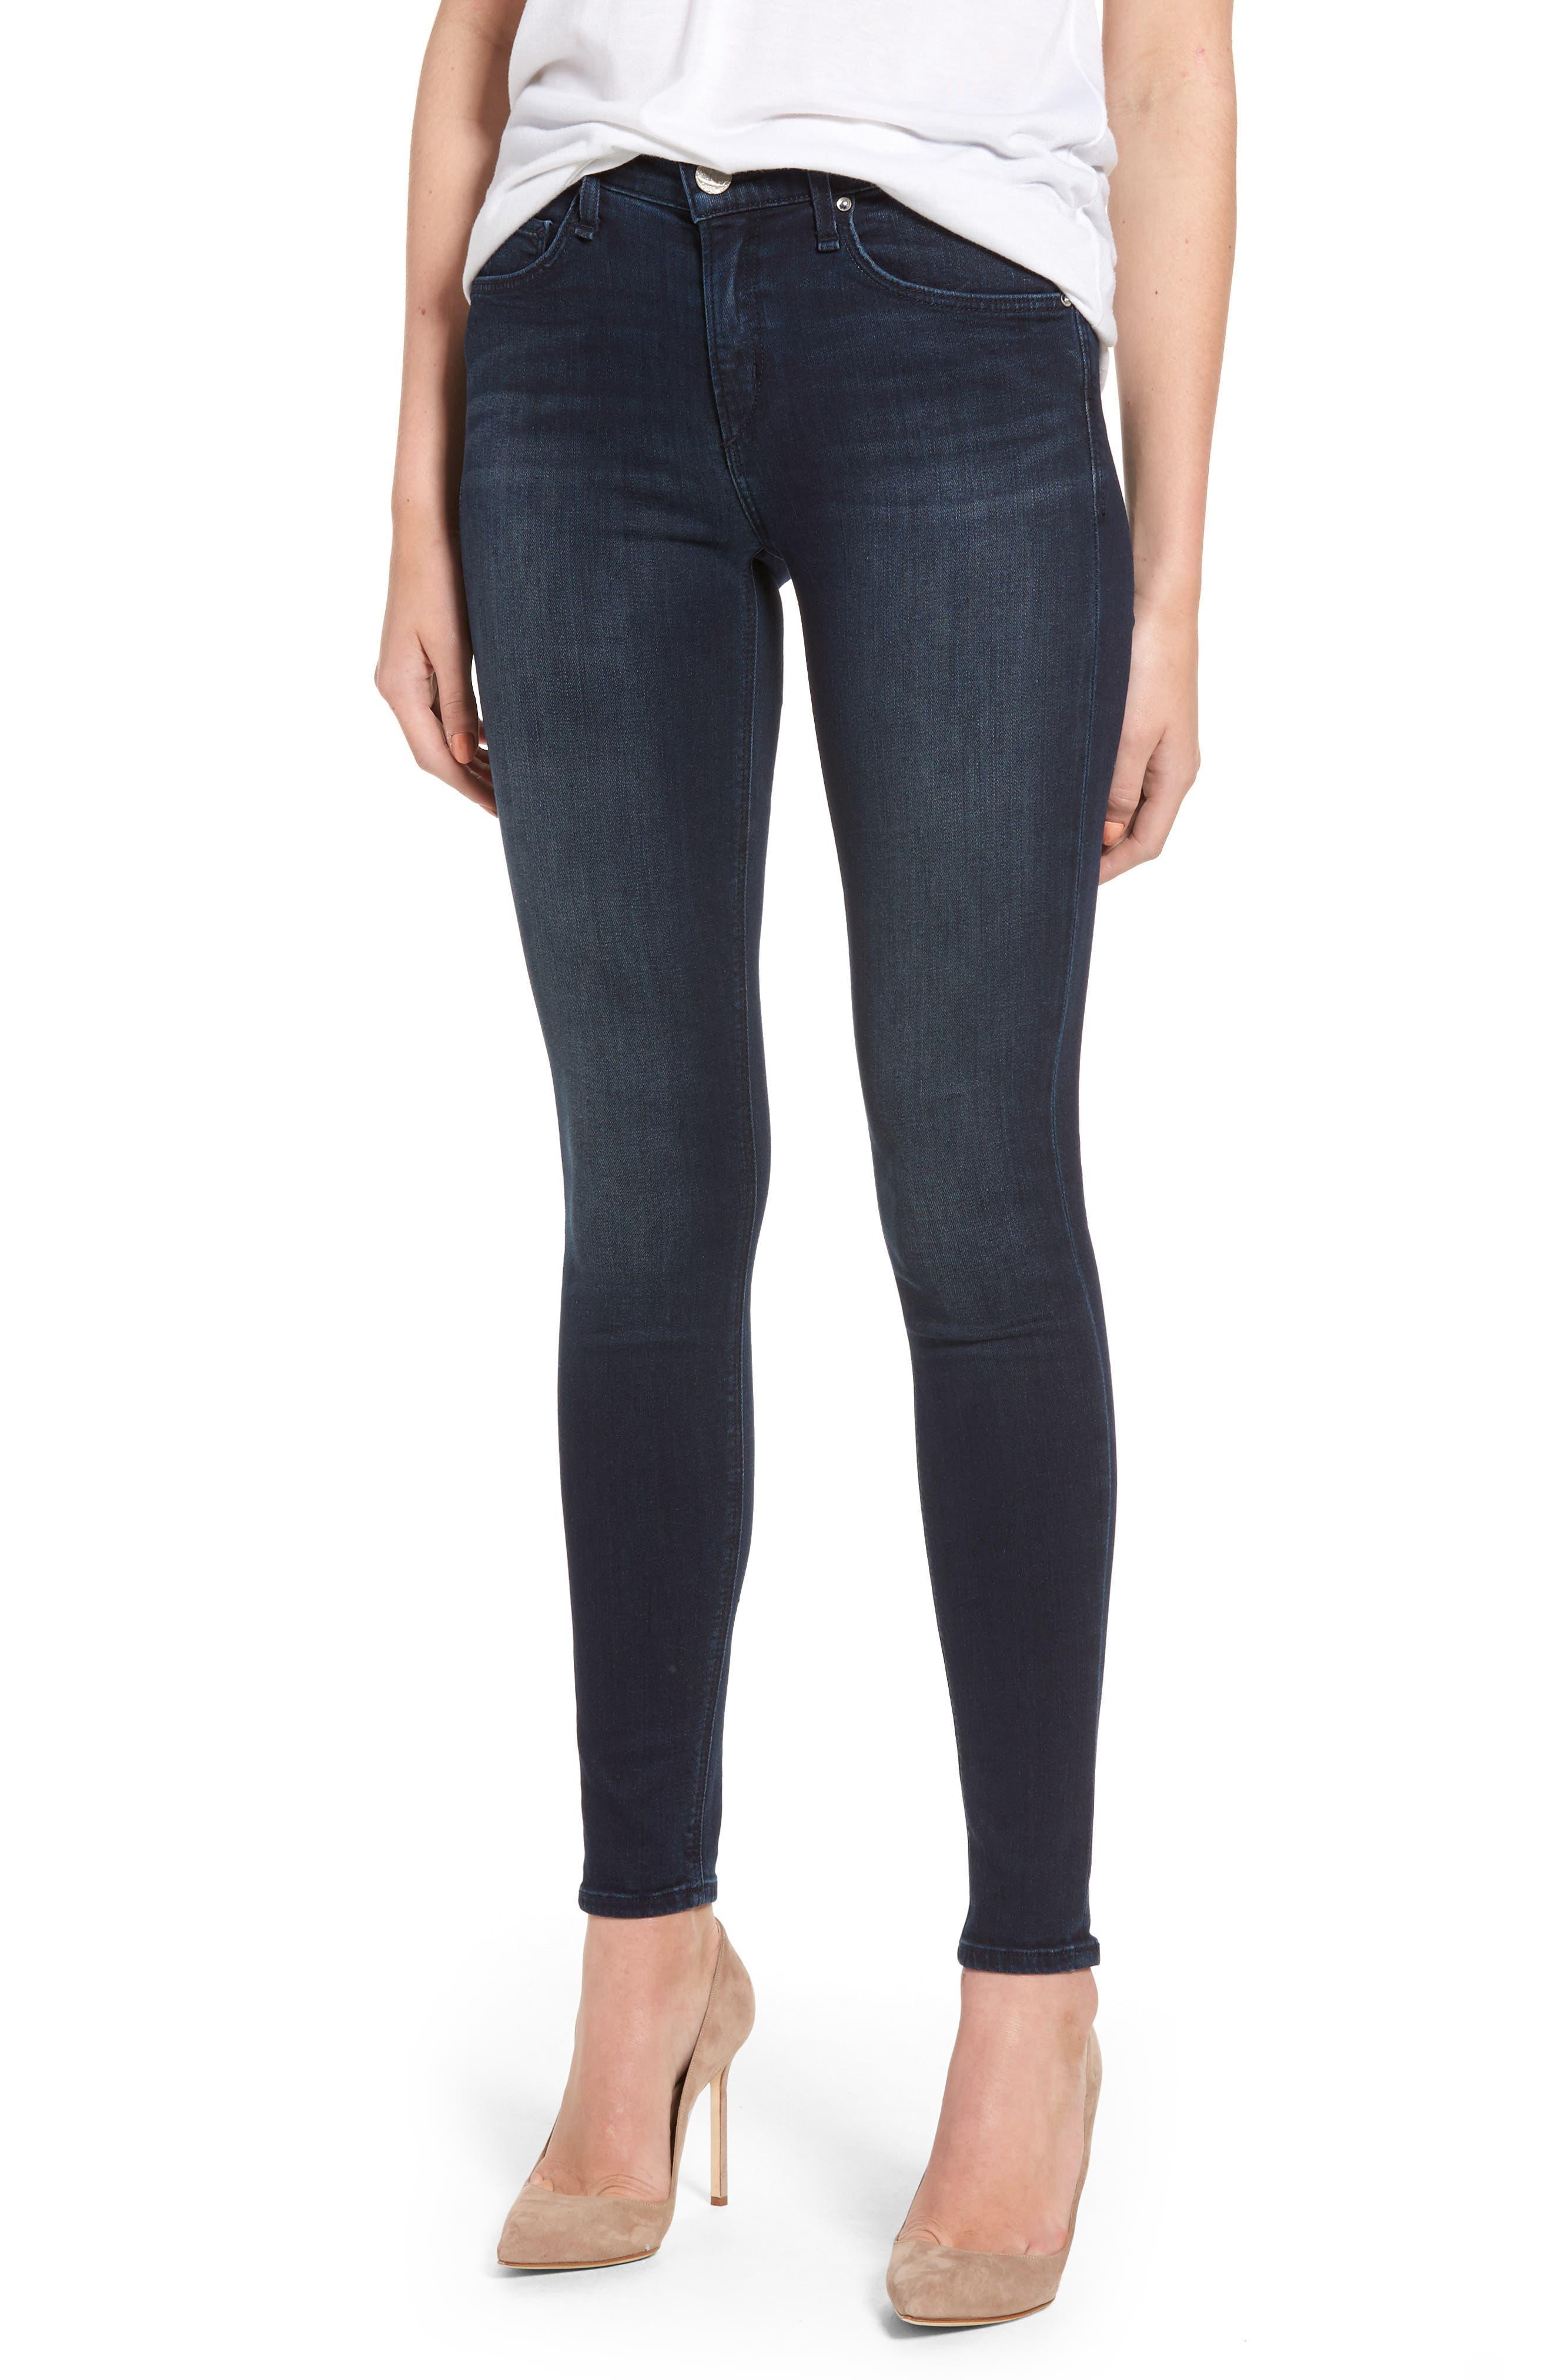 Main Image - McGuire Newton Skinny Jeans (Splash)